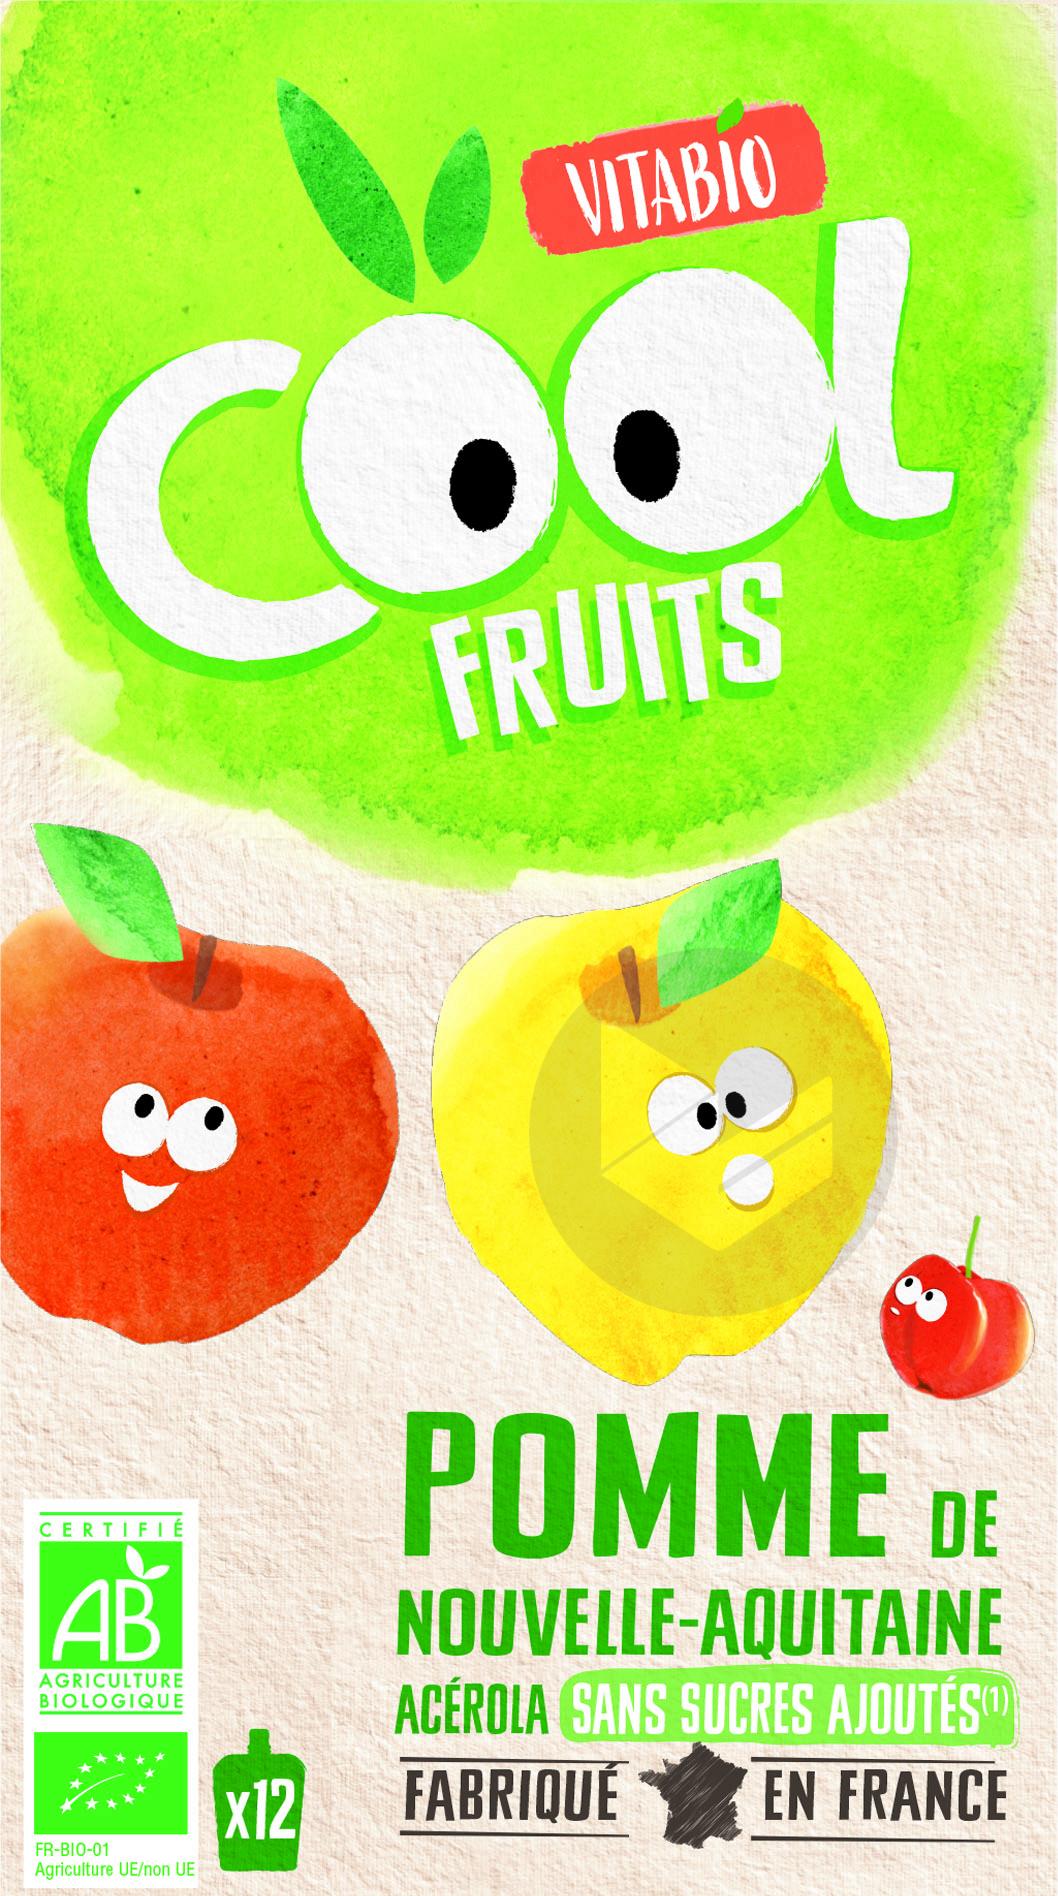 VITABIO Cool Fruits Pomme